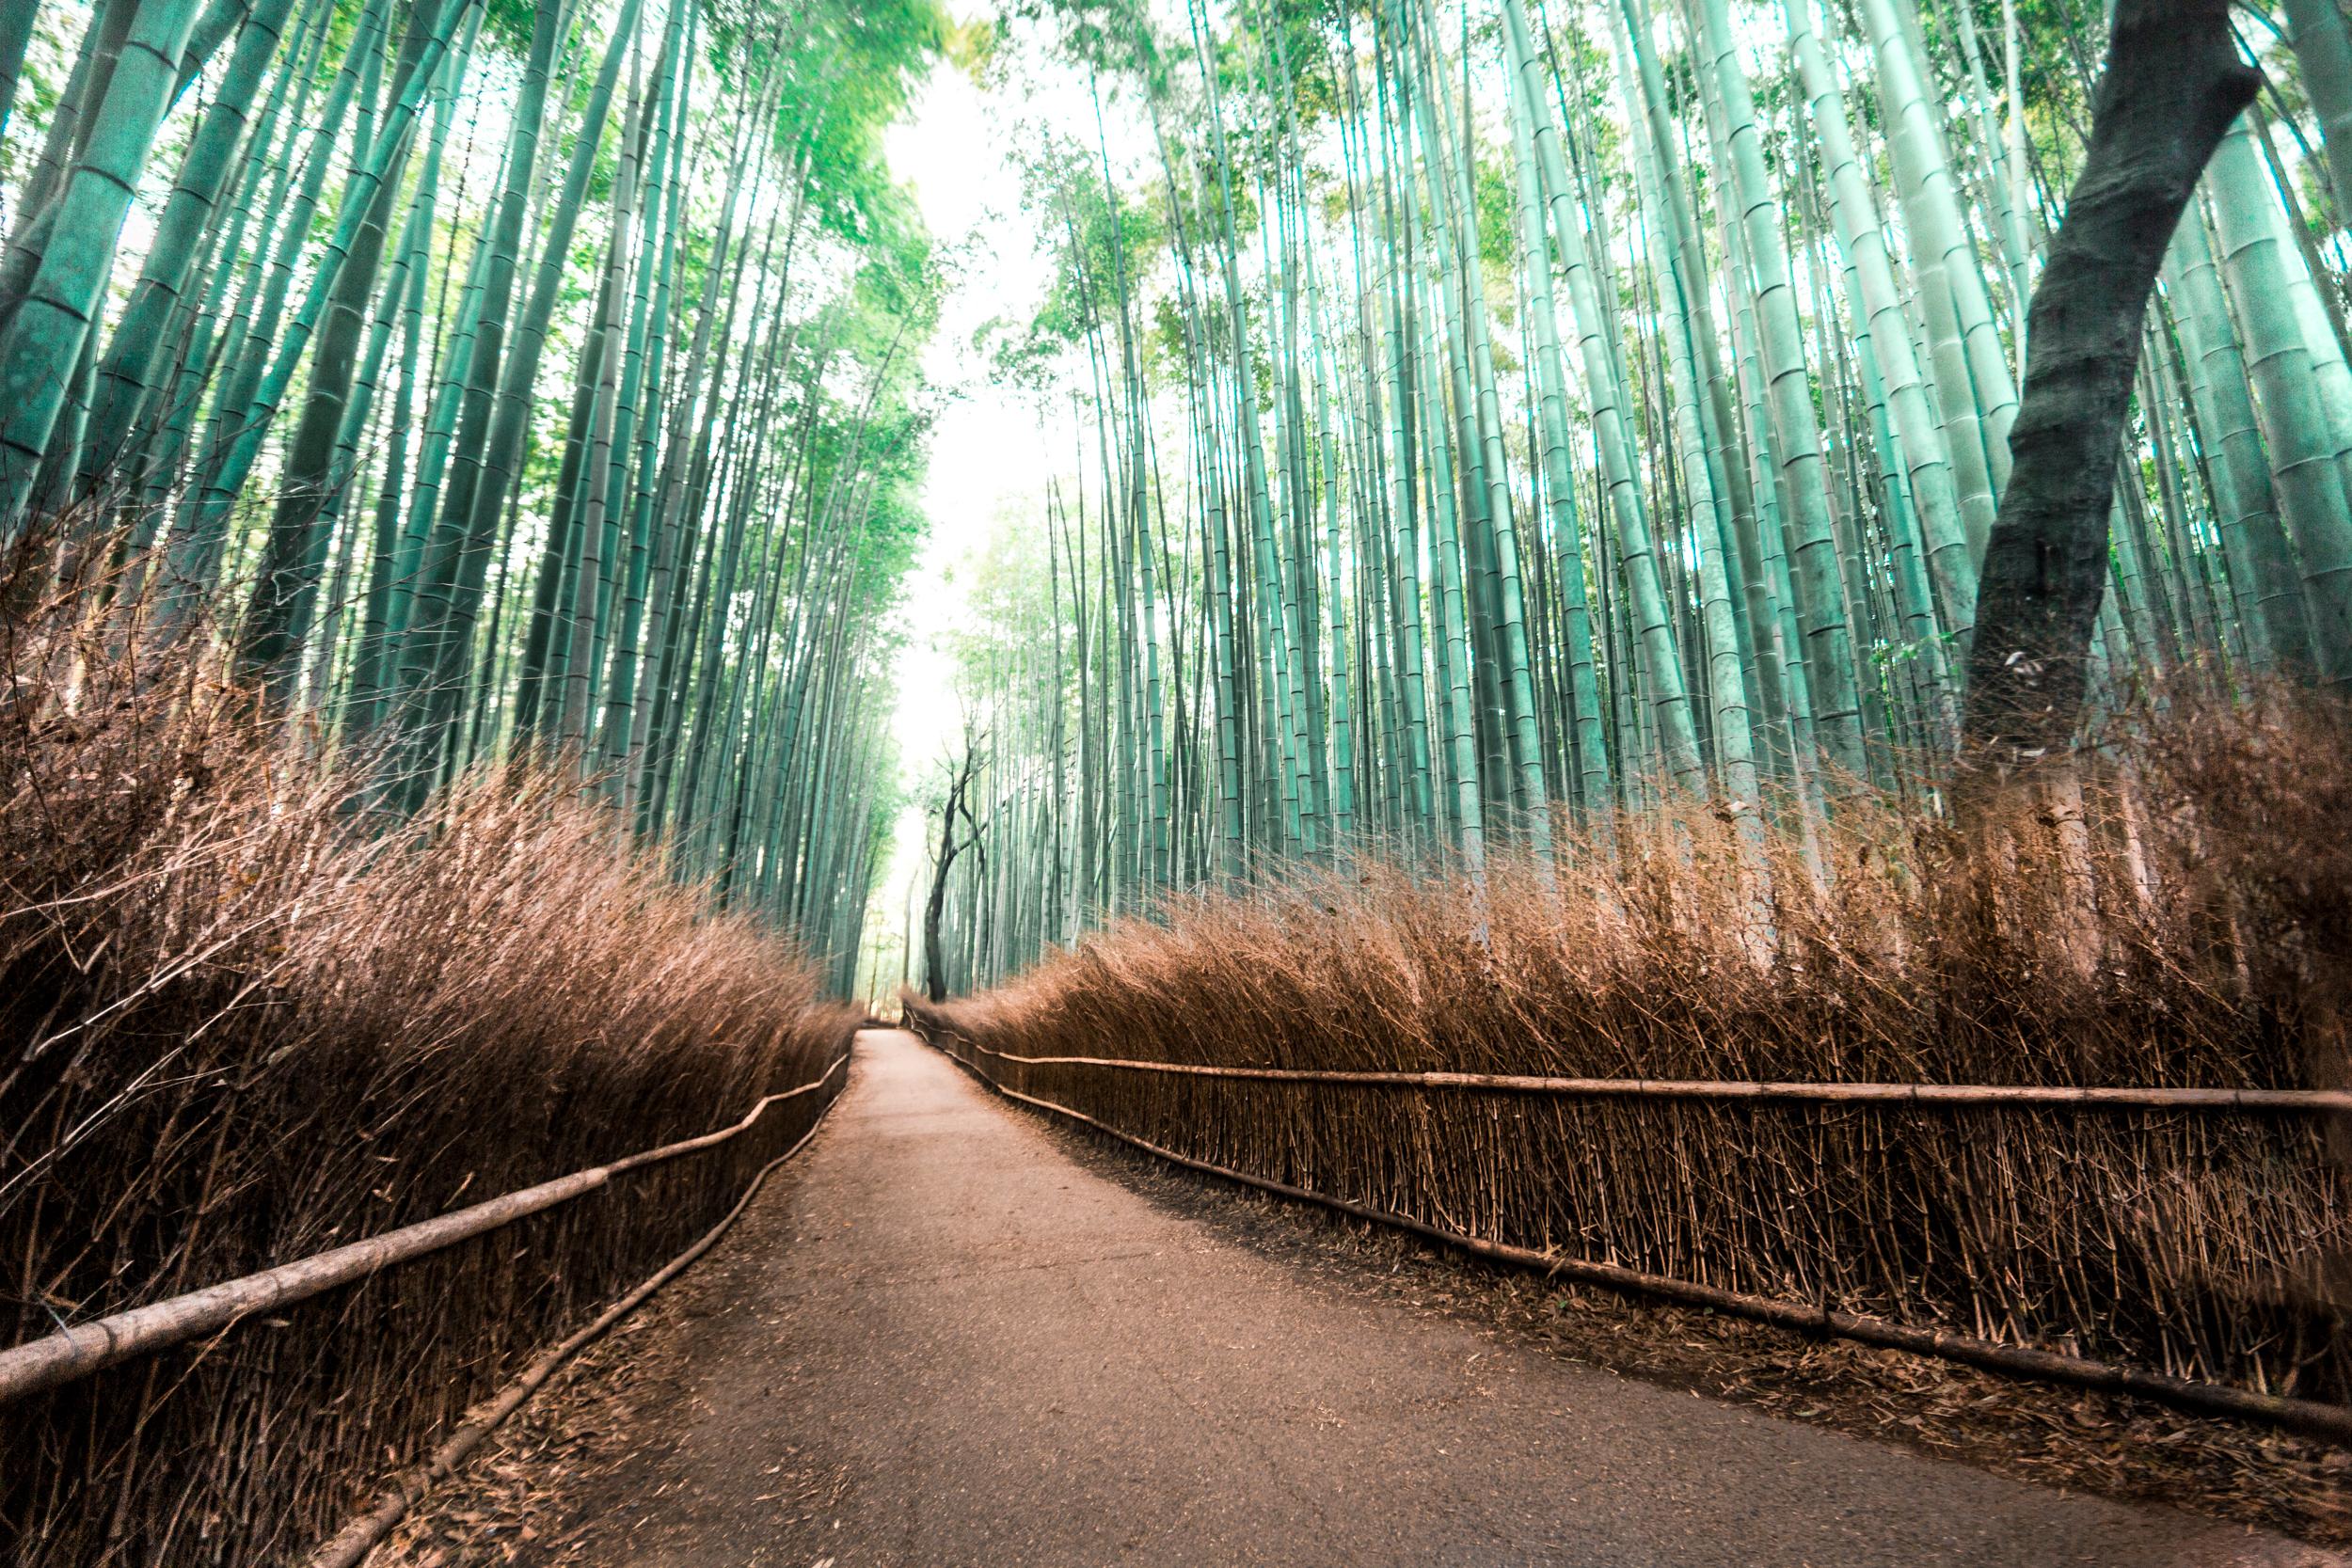 The Arashiyama bamboo grove outside of Kyoto, Japan.